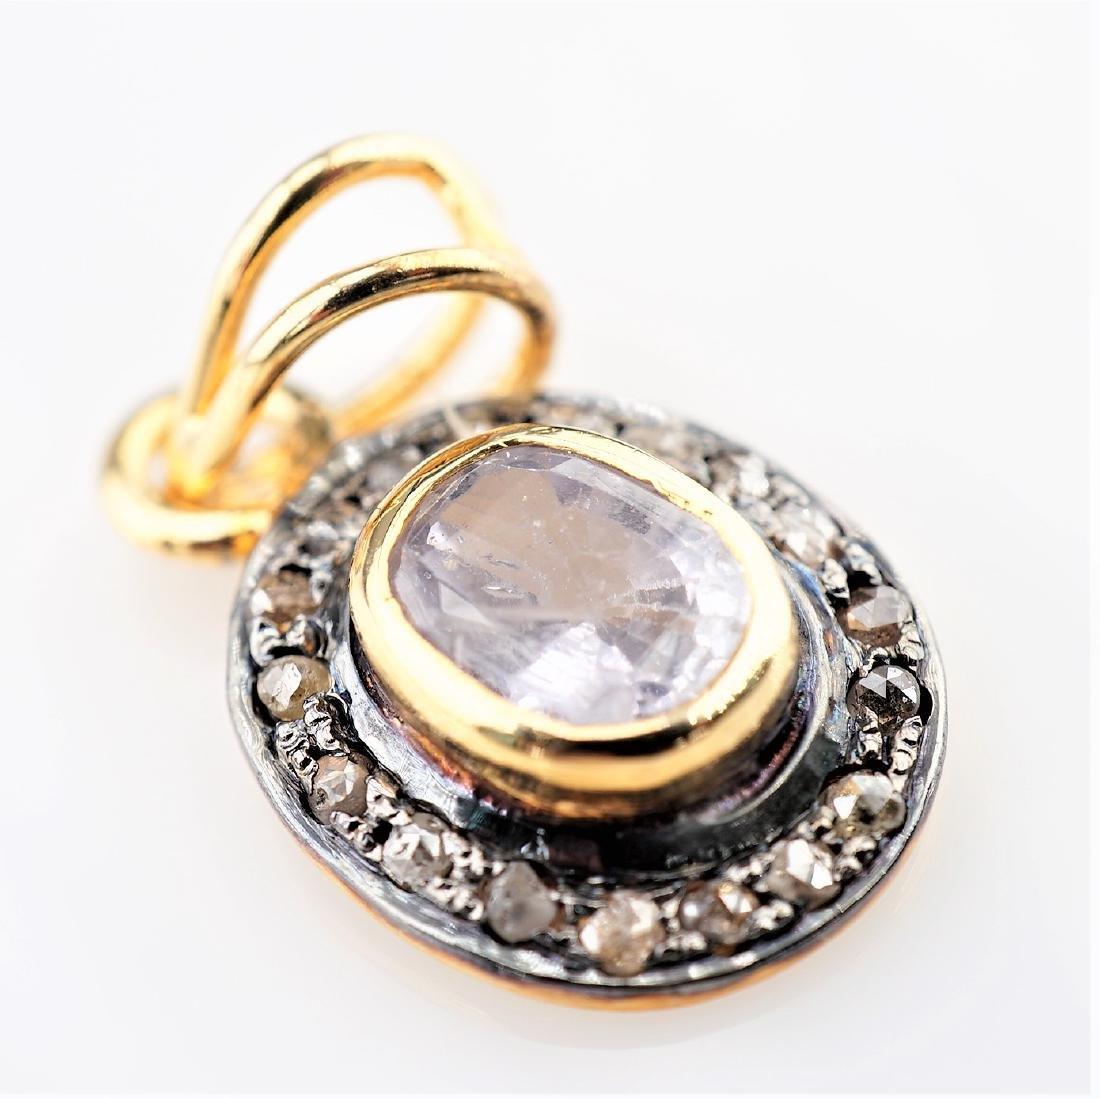 Blue sapphire pendant with Rose Cut Diamonds